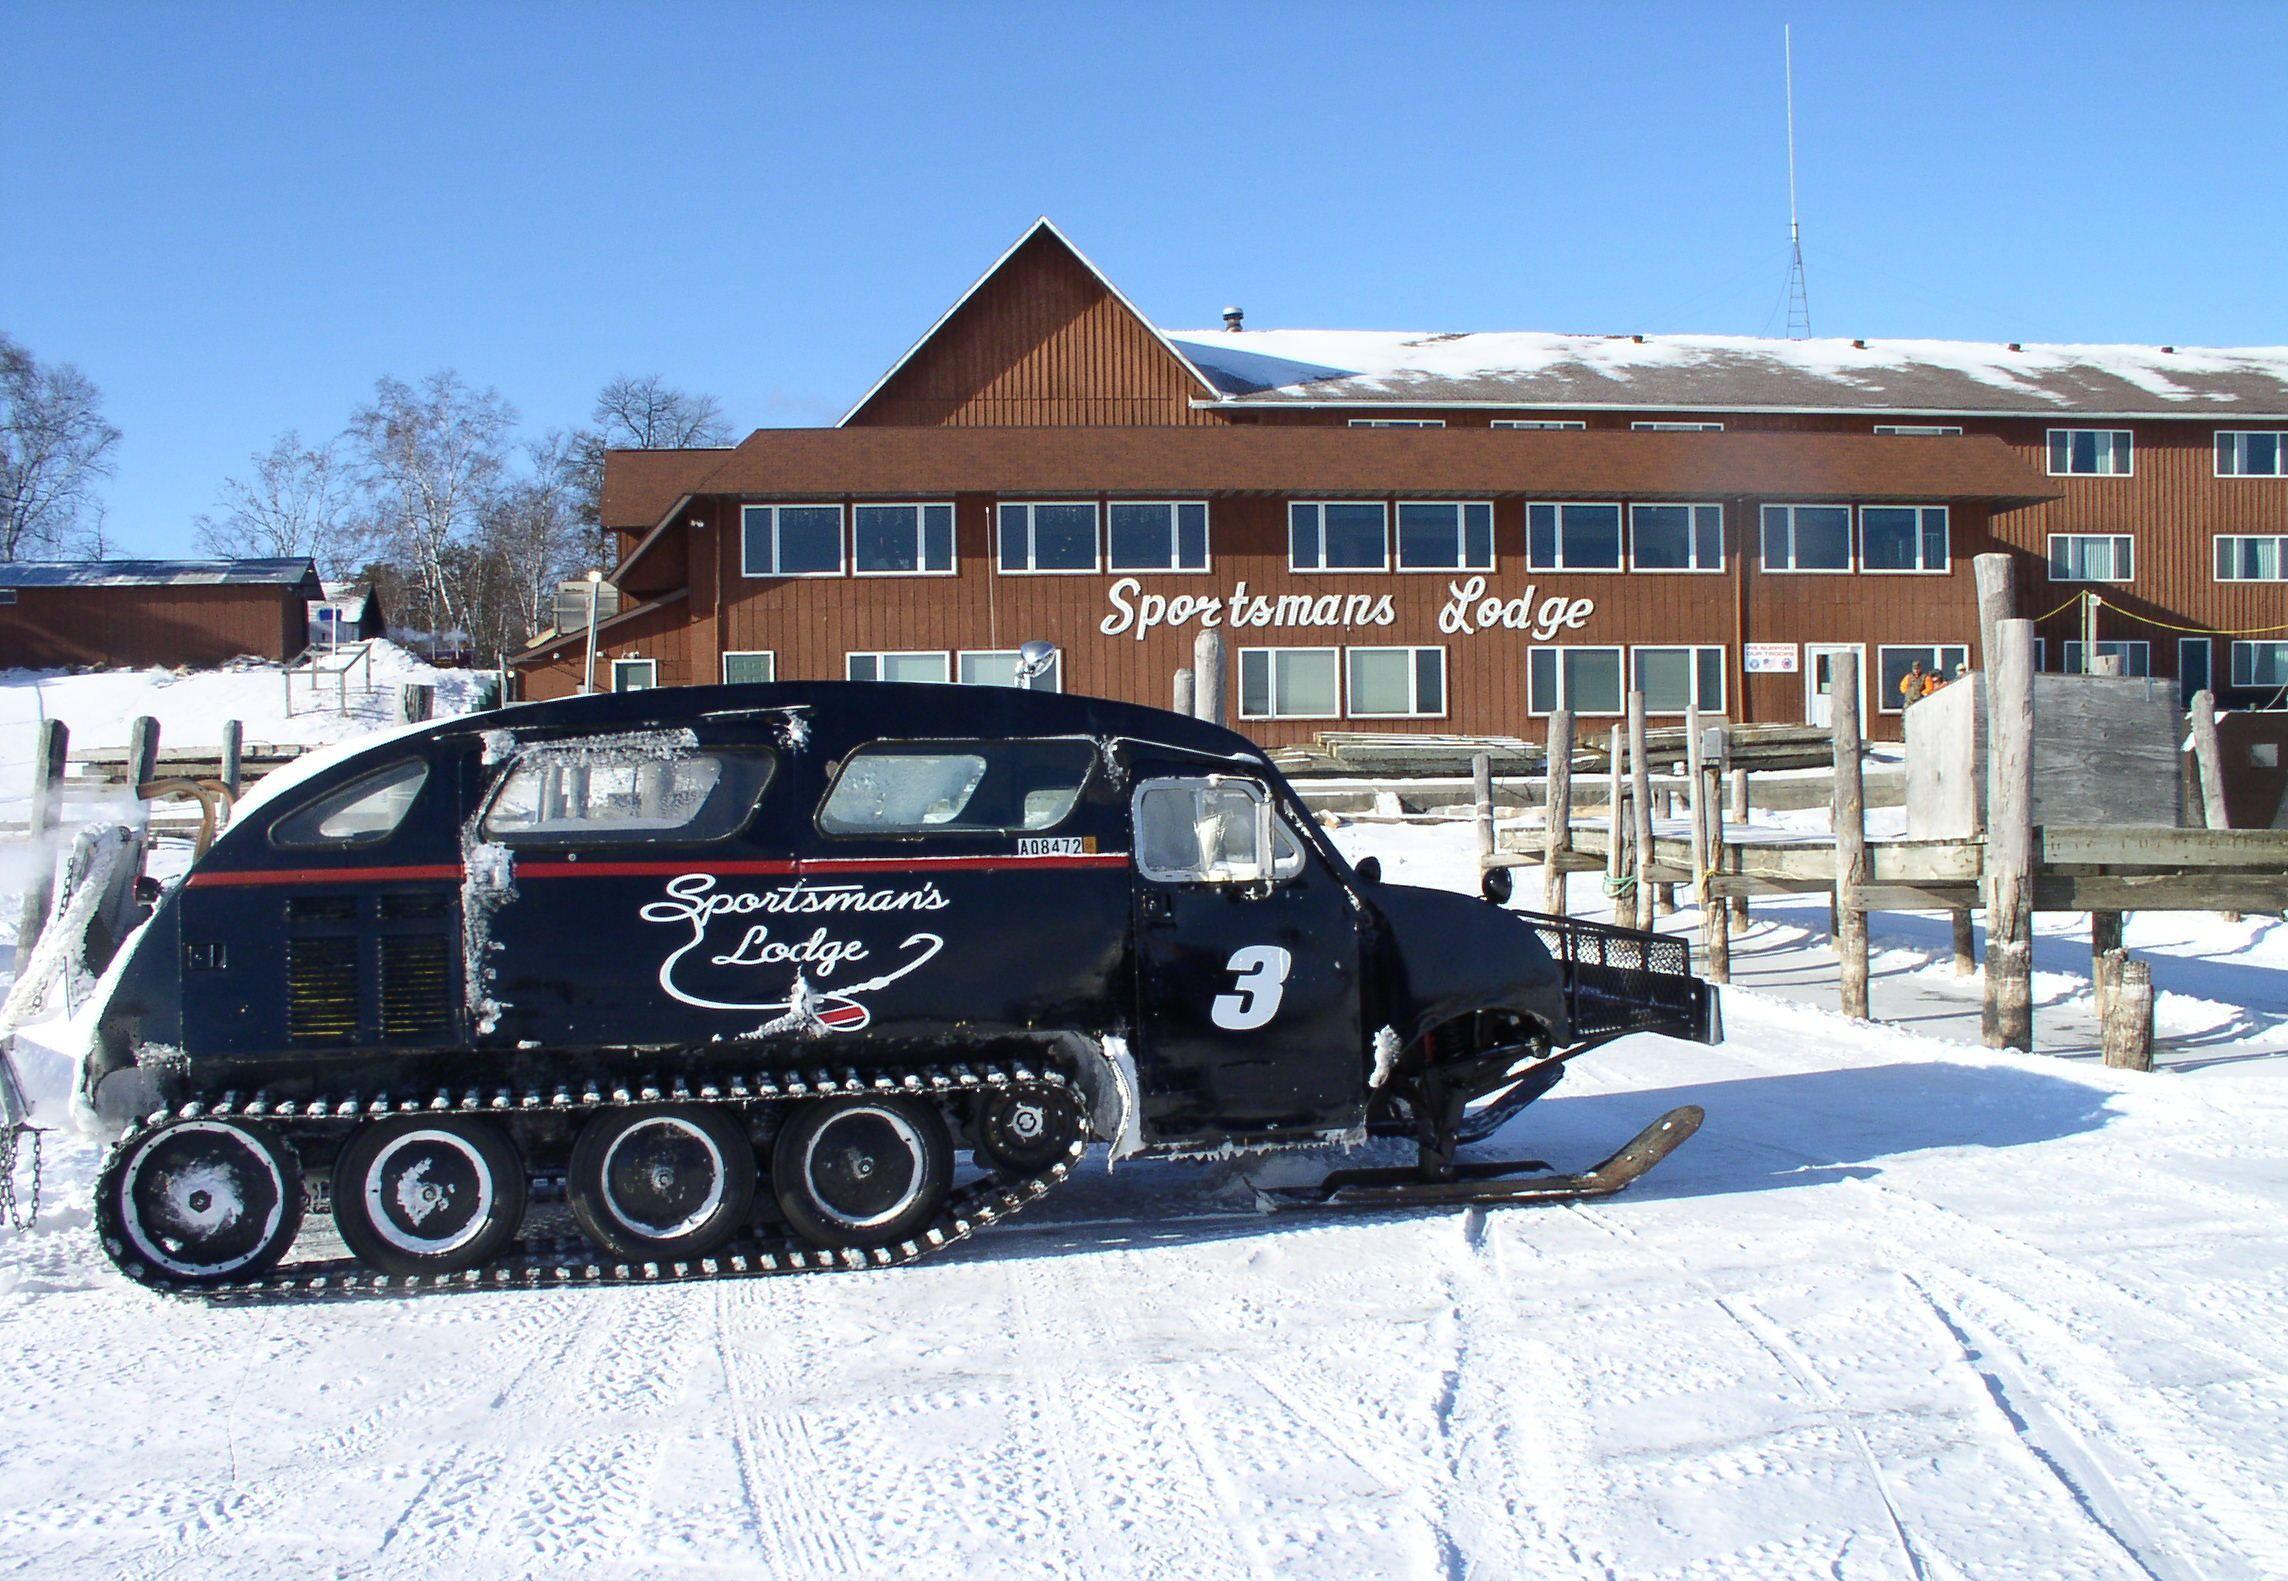 Sportsman 39 s lodge baudette mn ice fishing pinterest for Minnesota fishing cabins